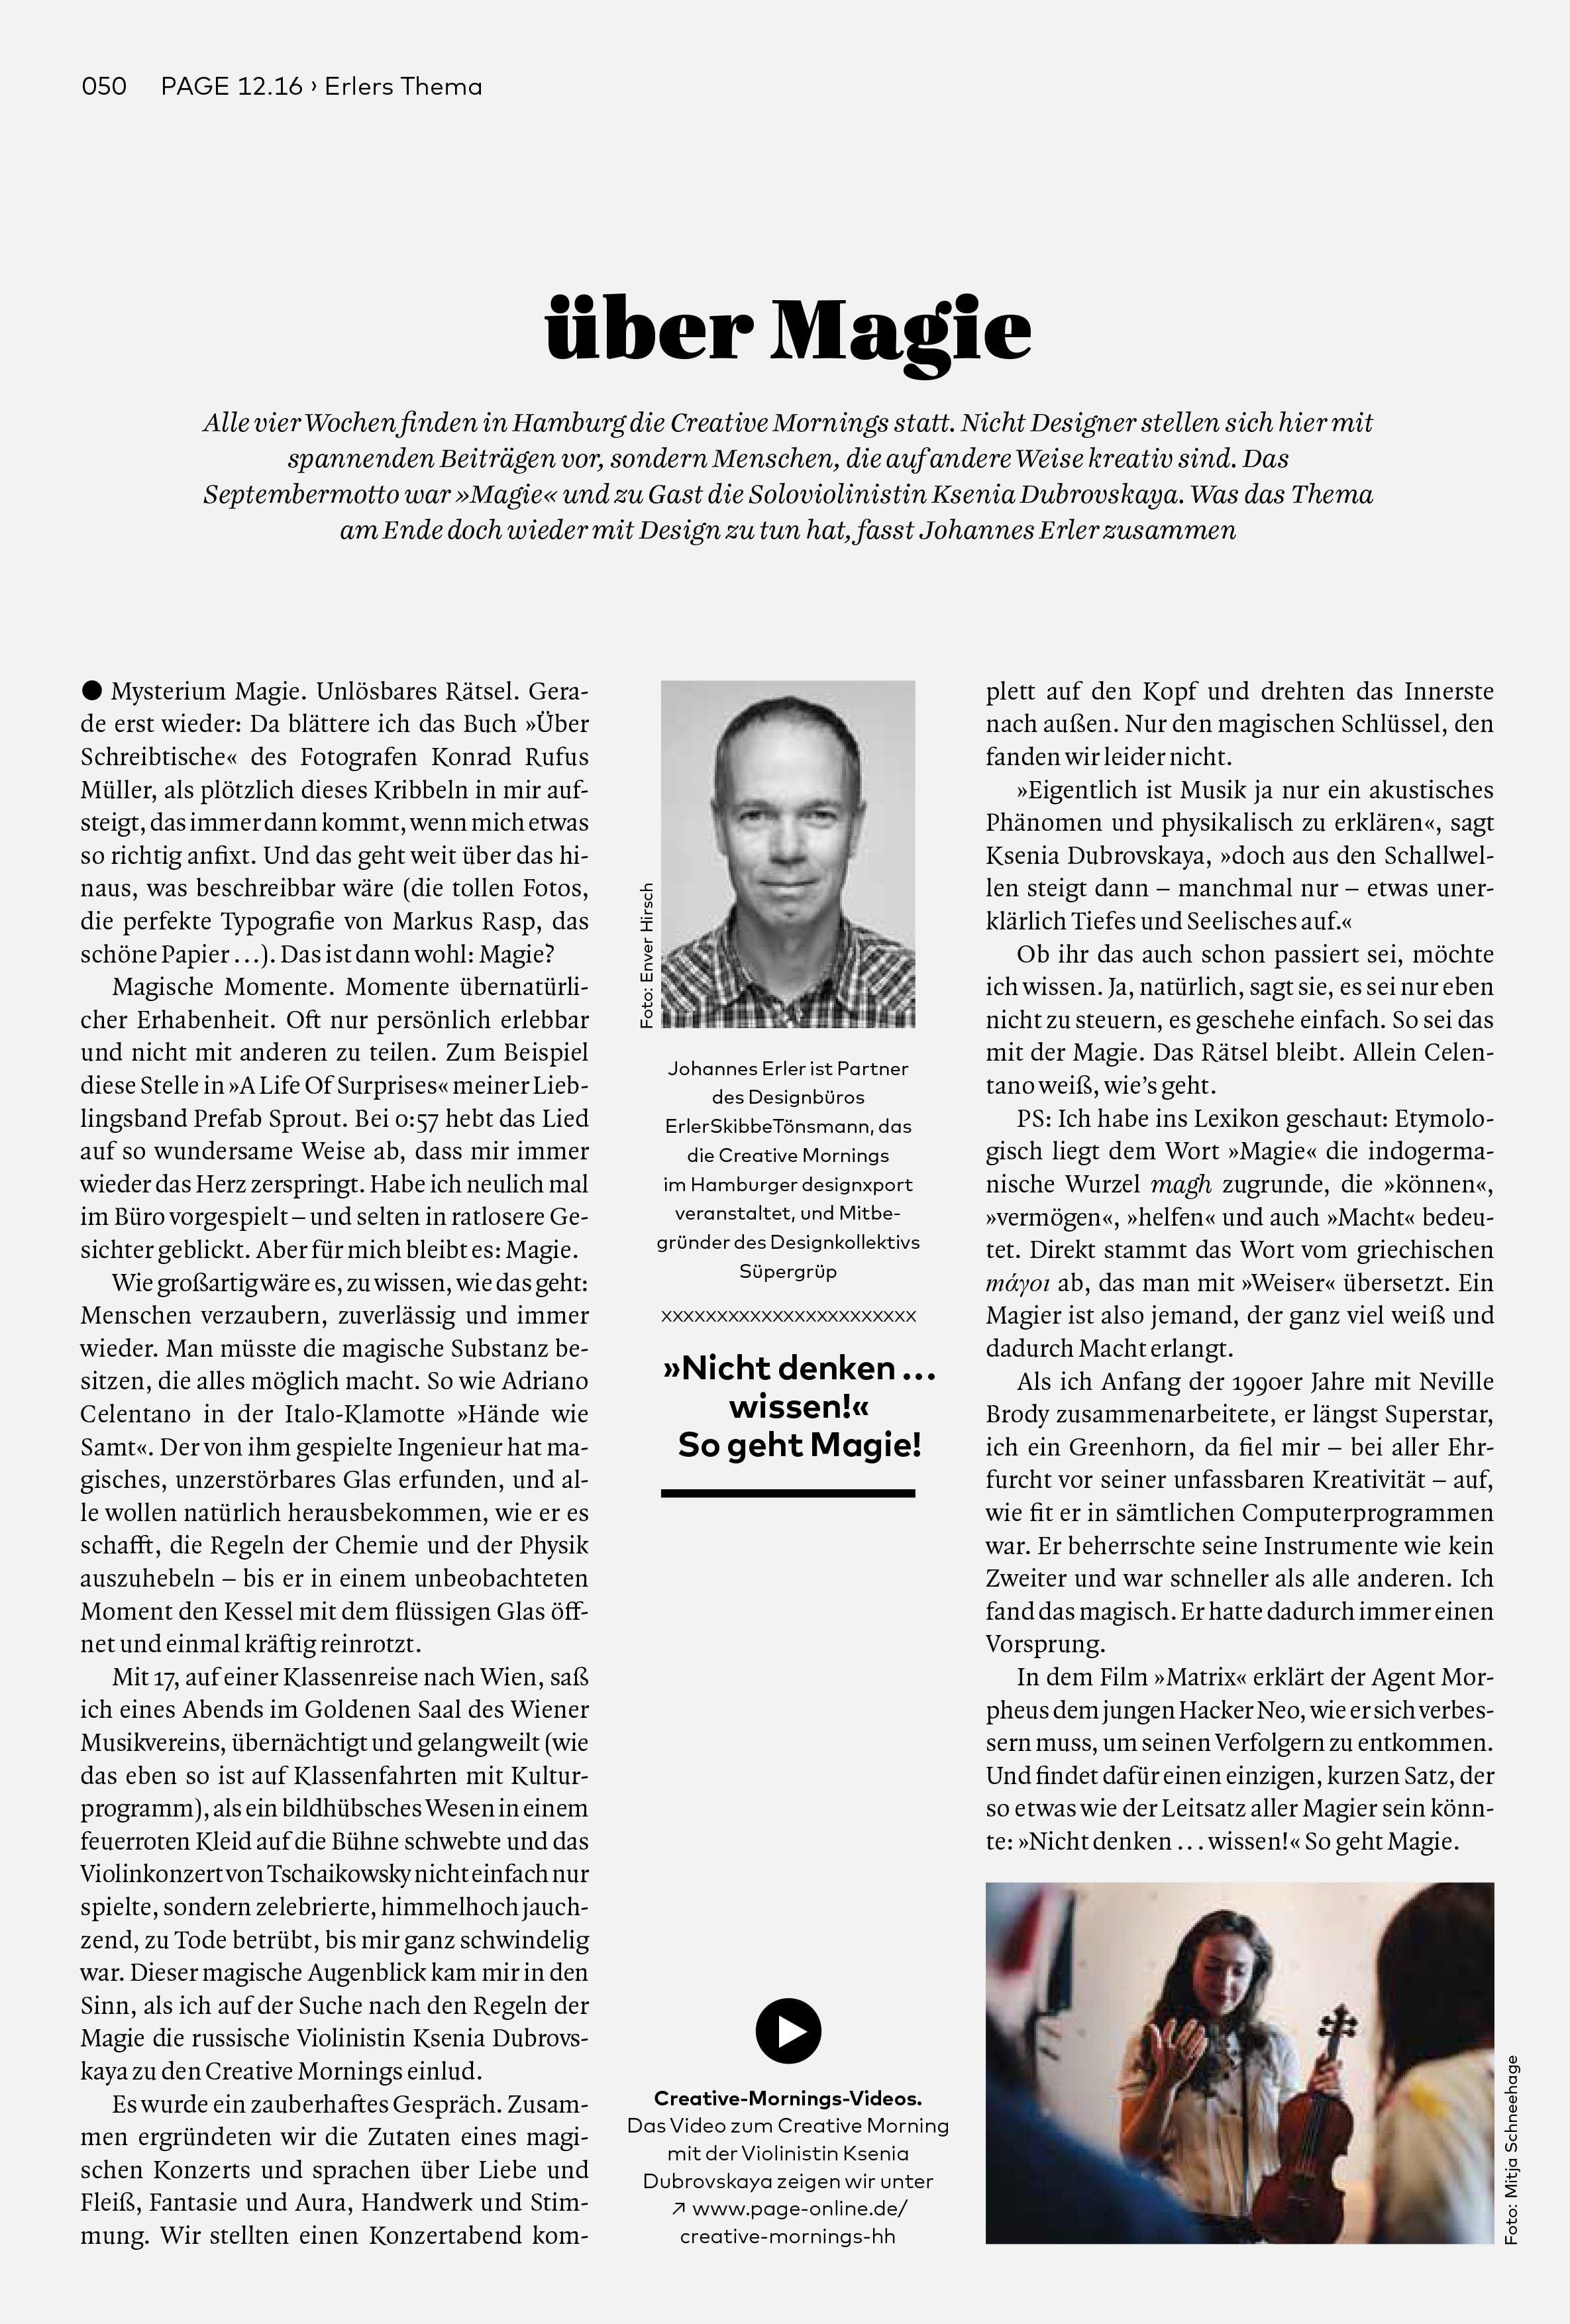 Bureau Johannes Erler – über Magie